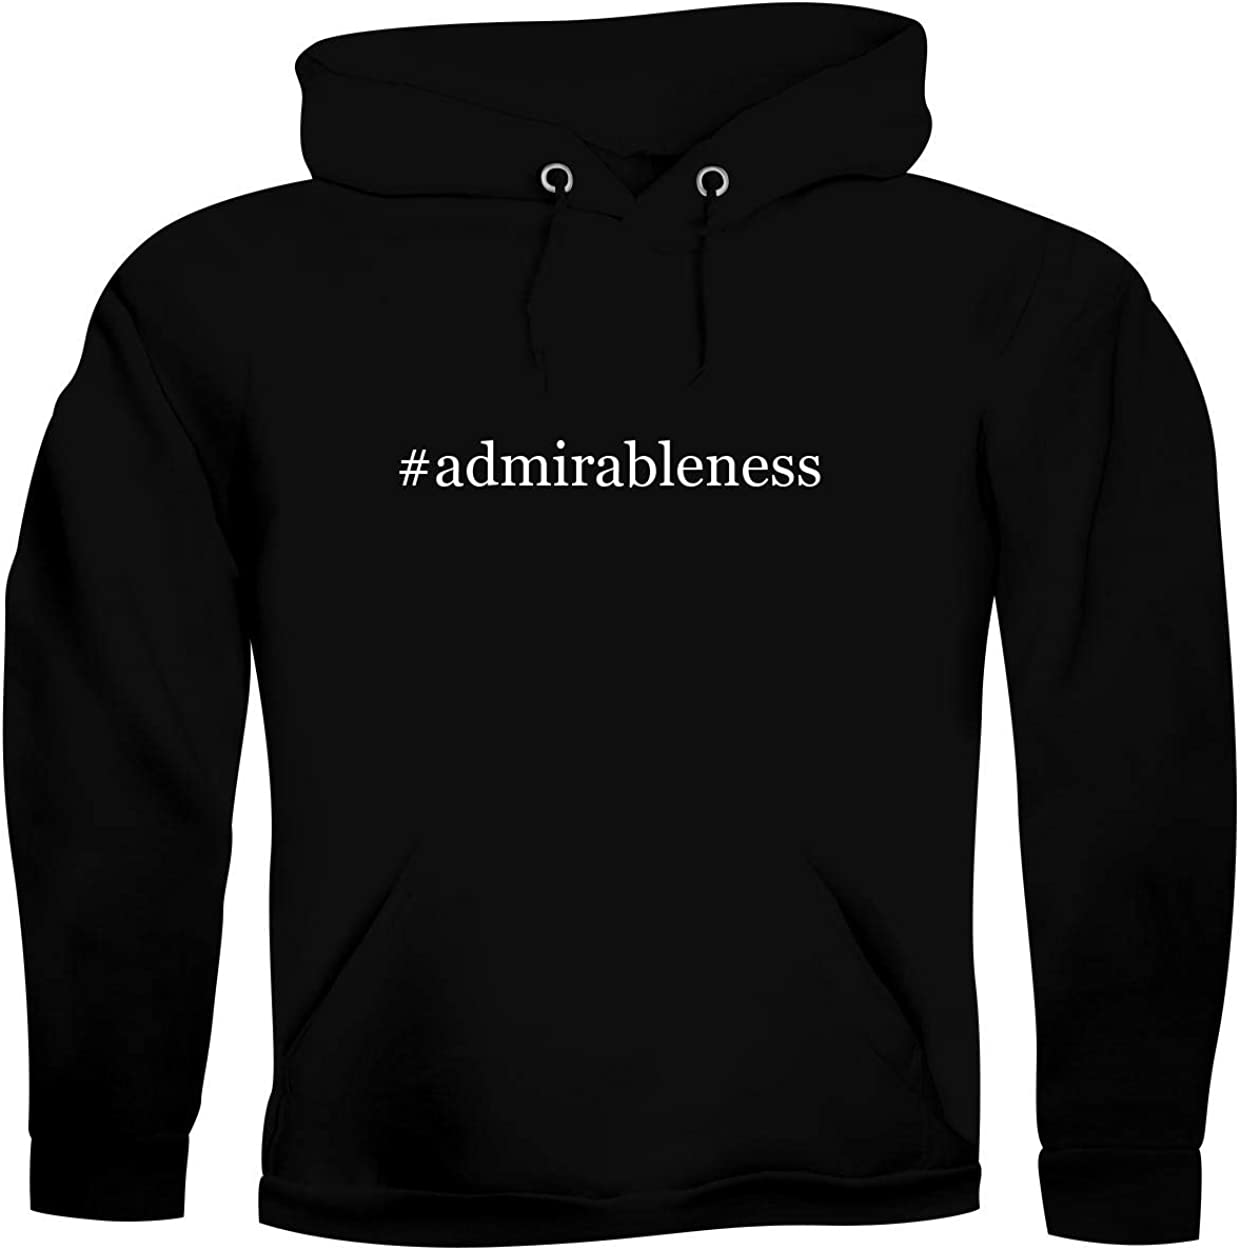 #admirableness - Men's Hashtag Ultra Soft Hoodie Sweatshirt